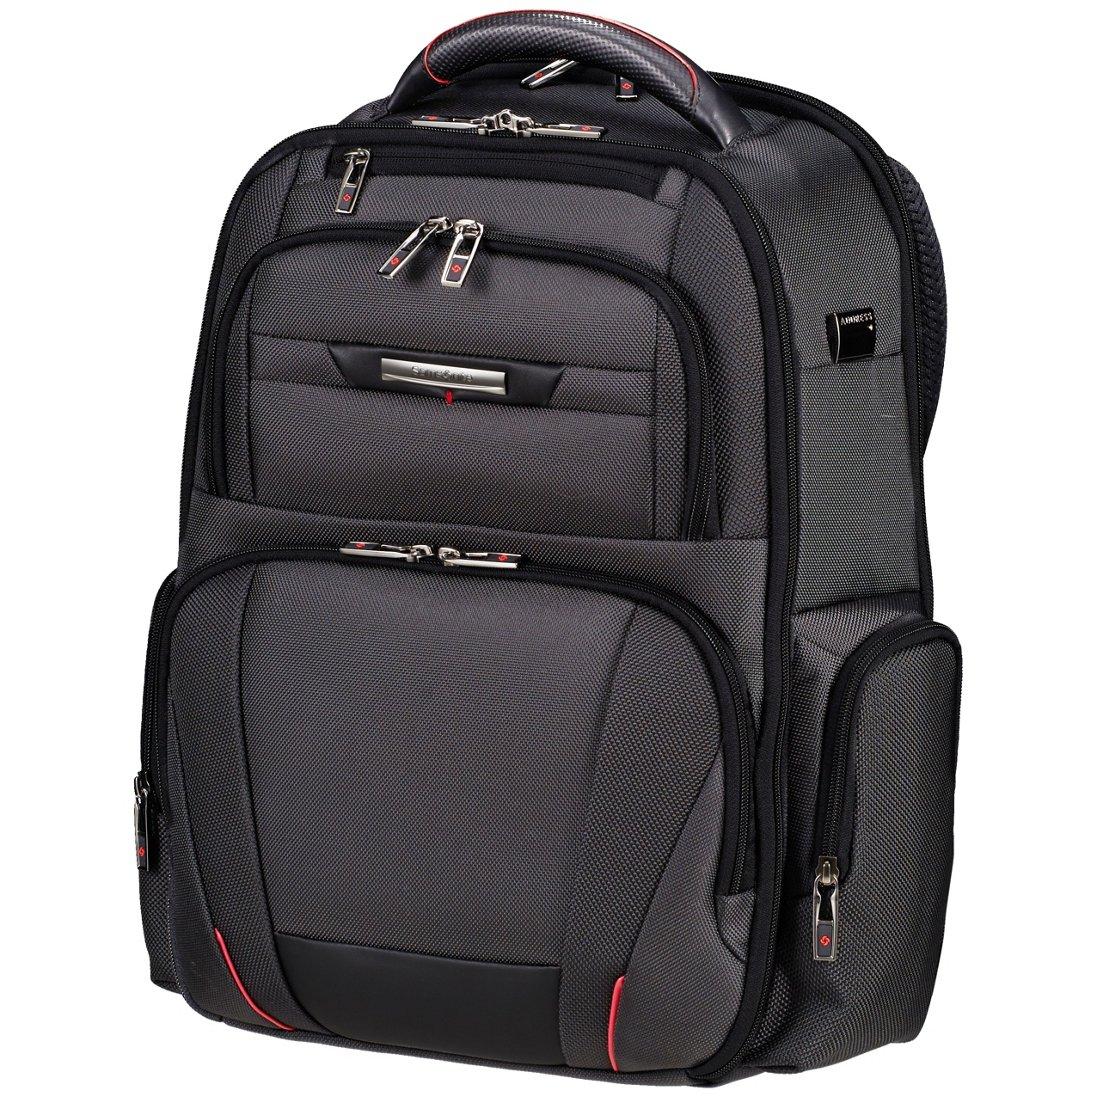 a89e8356bc86f Samsonite Pro-DLX 5 Laptop Rucksack 3V 48 cm - koffer-direkt.de